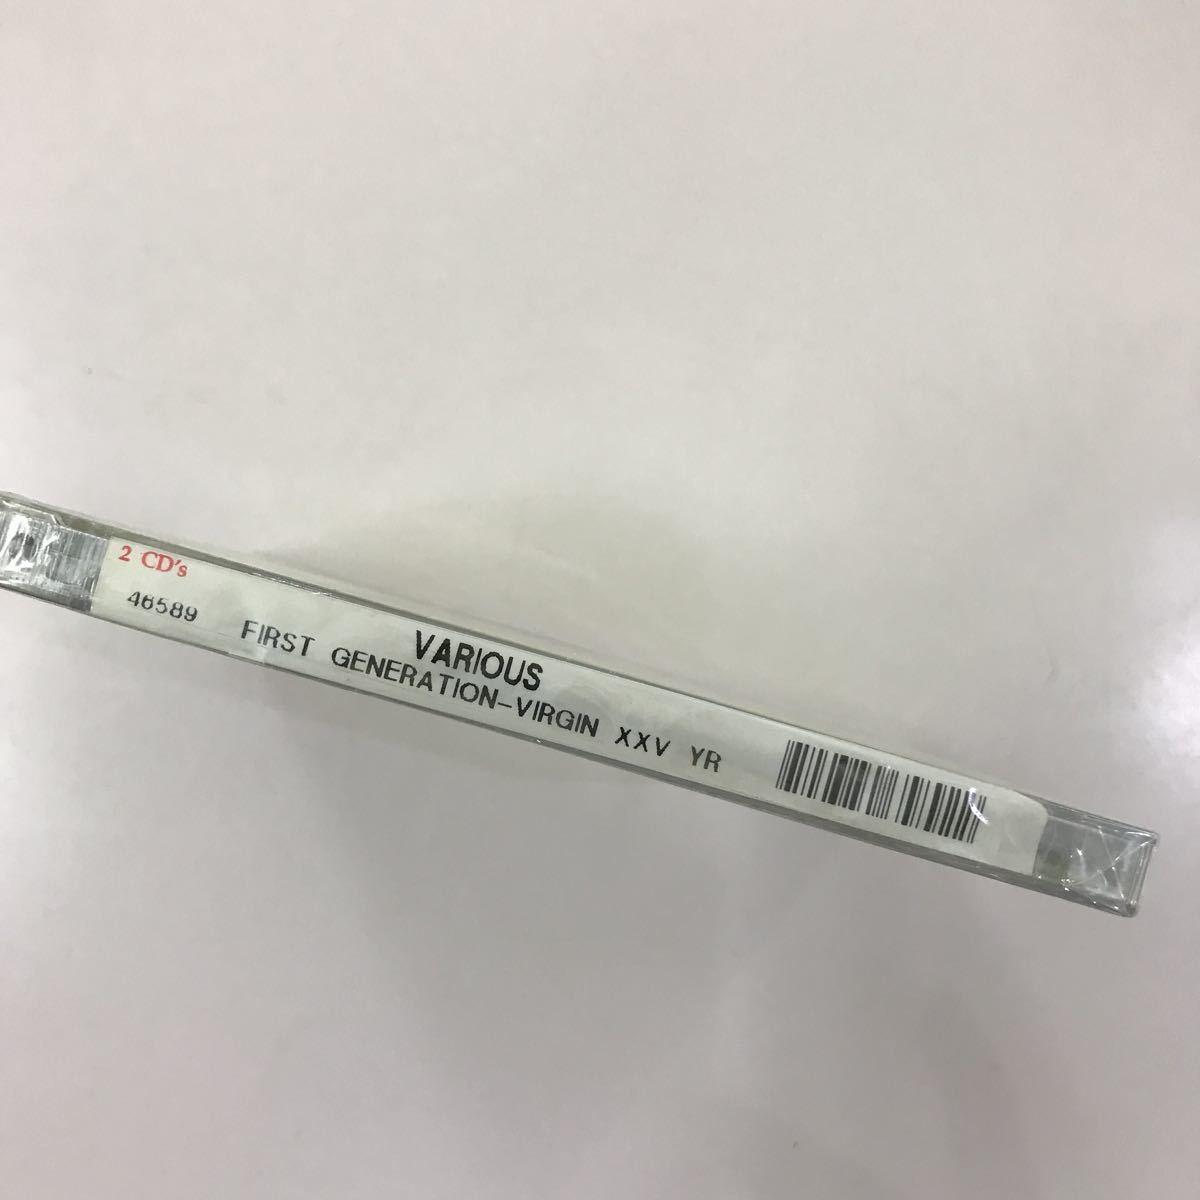 CD 未開封【洋楽】長期保存品 firt generation